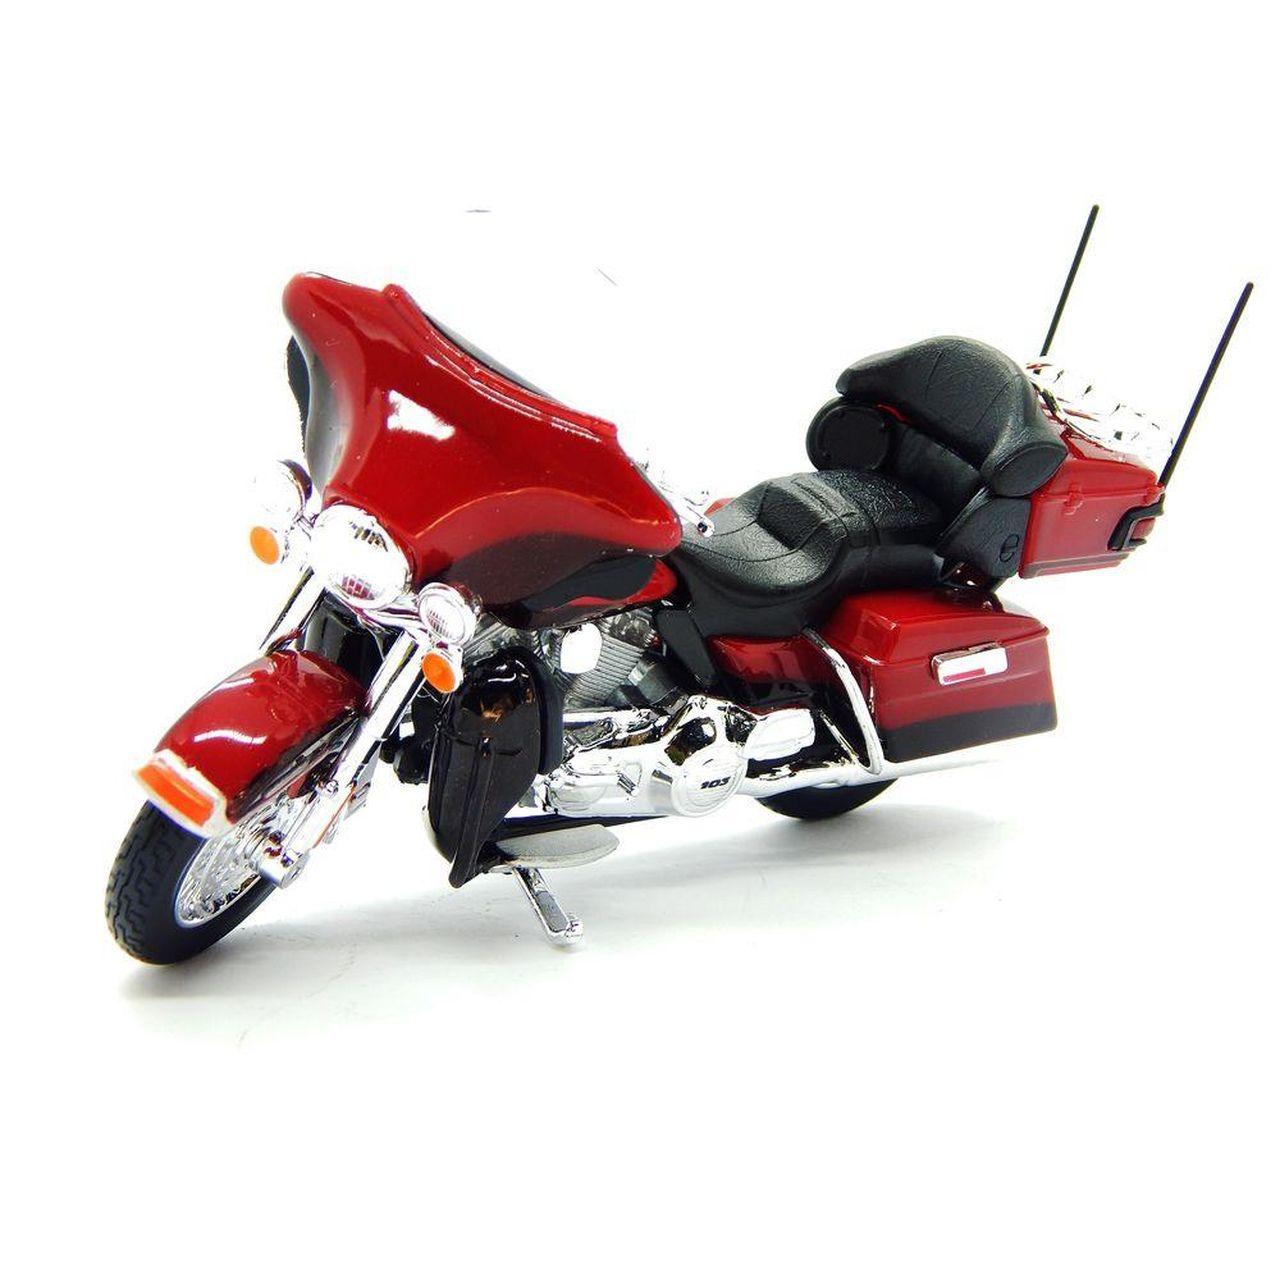 Miniatura Moto 2013 FLHTK Electra Glide Ultra Limited: Harley Davidson (Serie 34) Escala 1/18 - Maisco